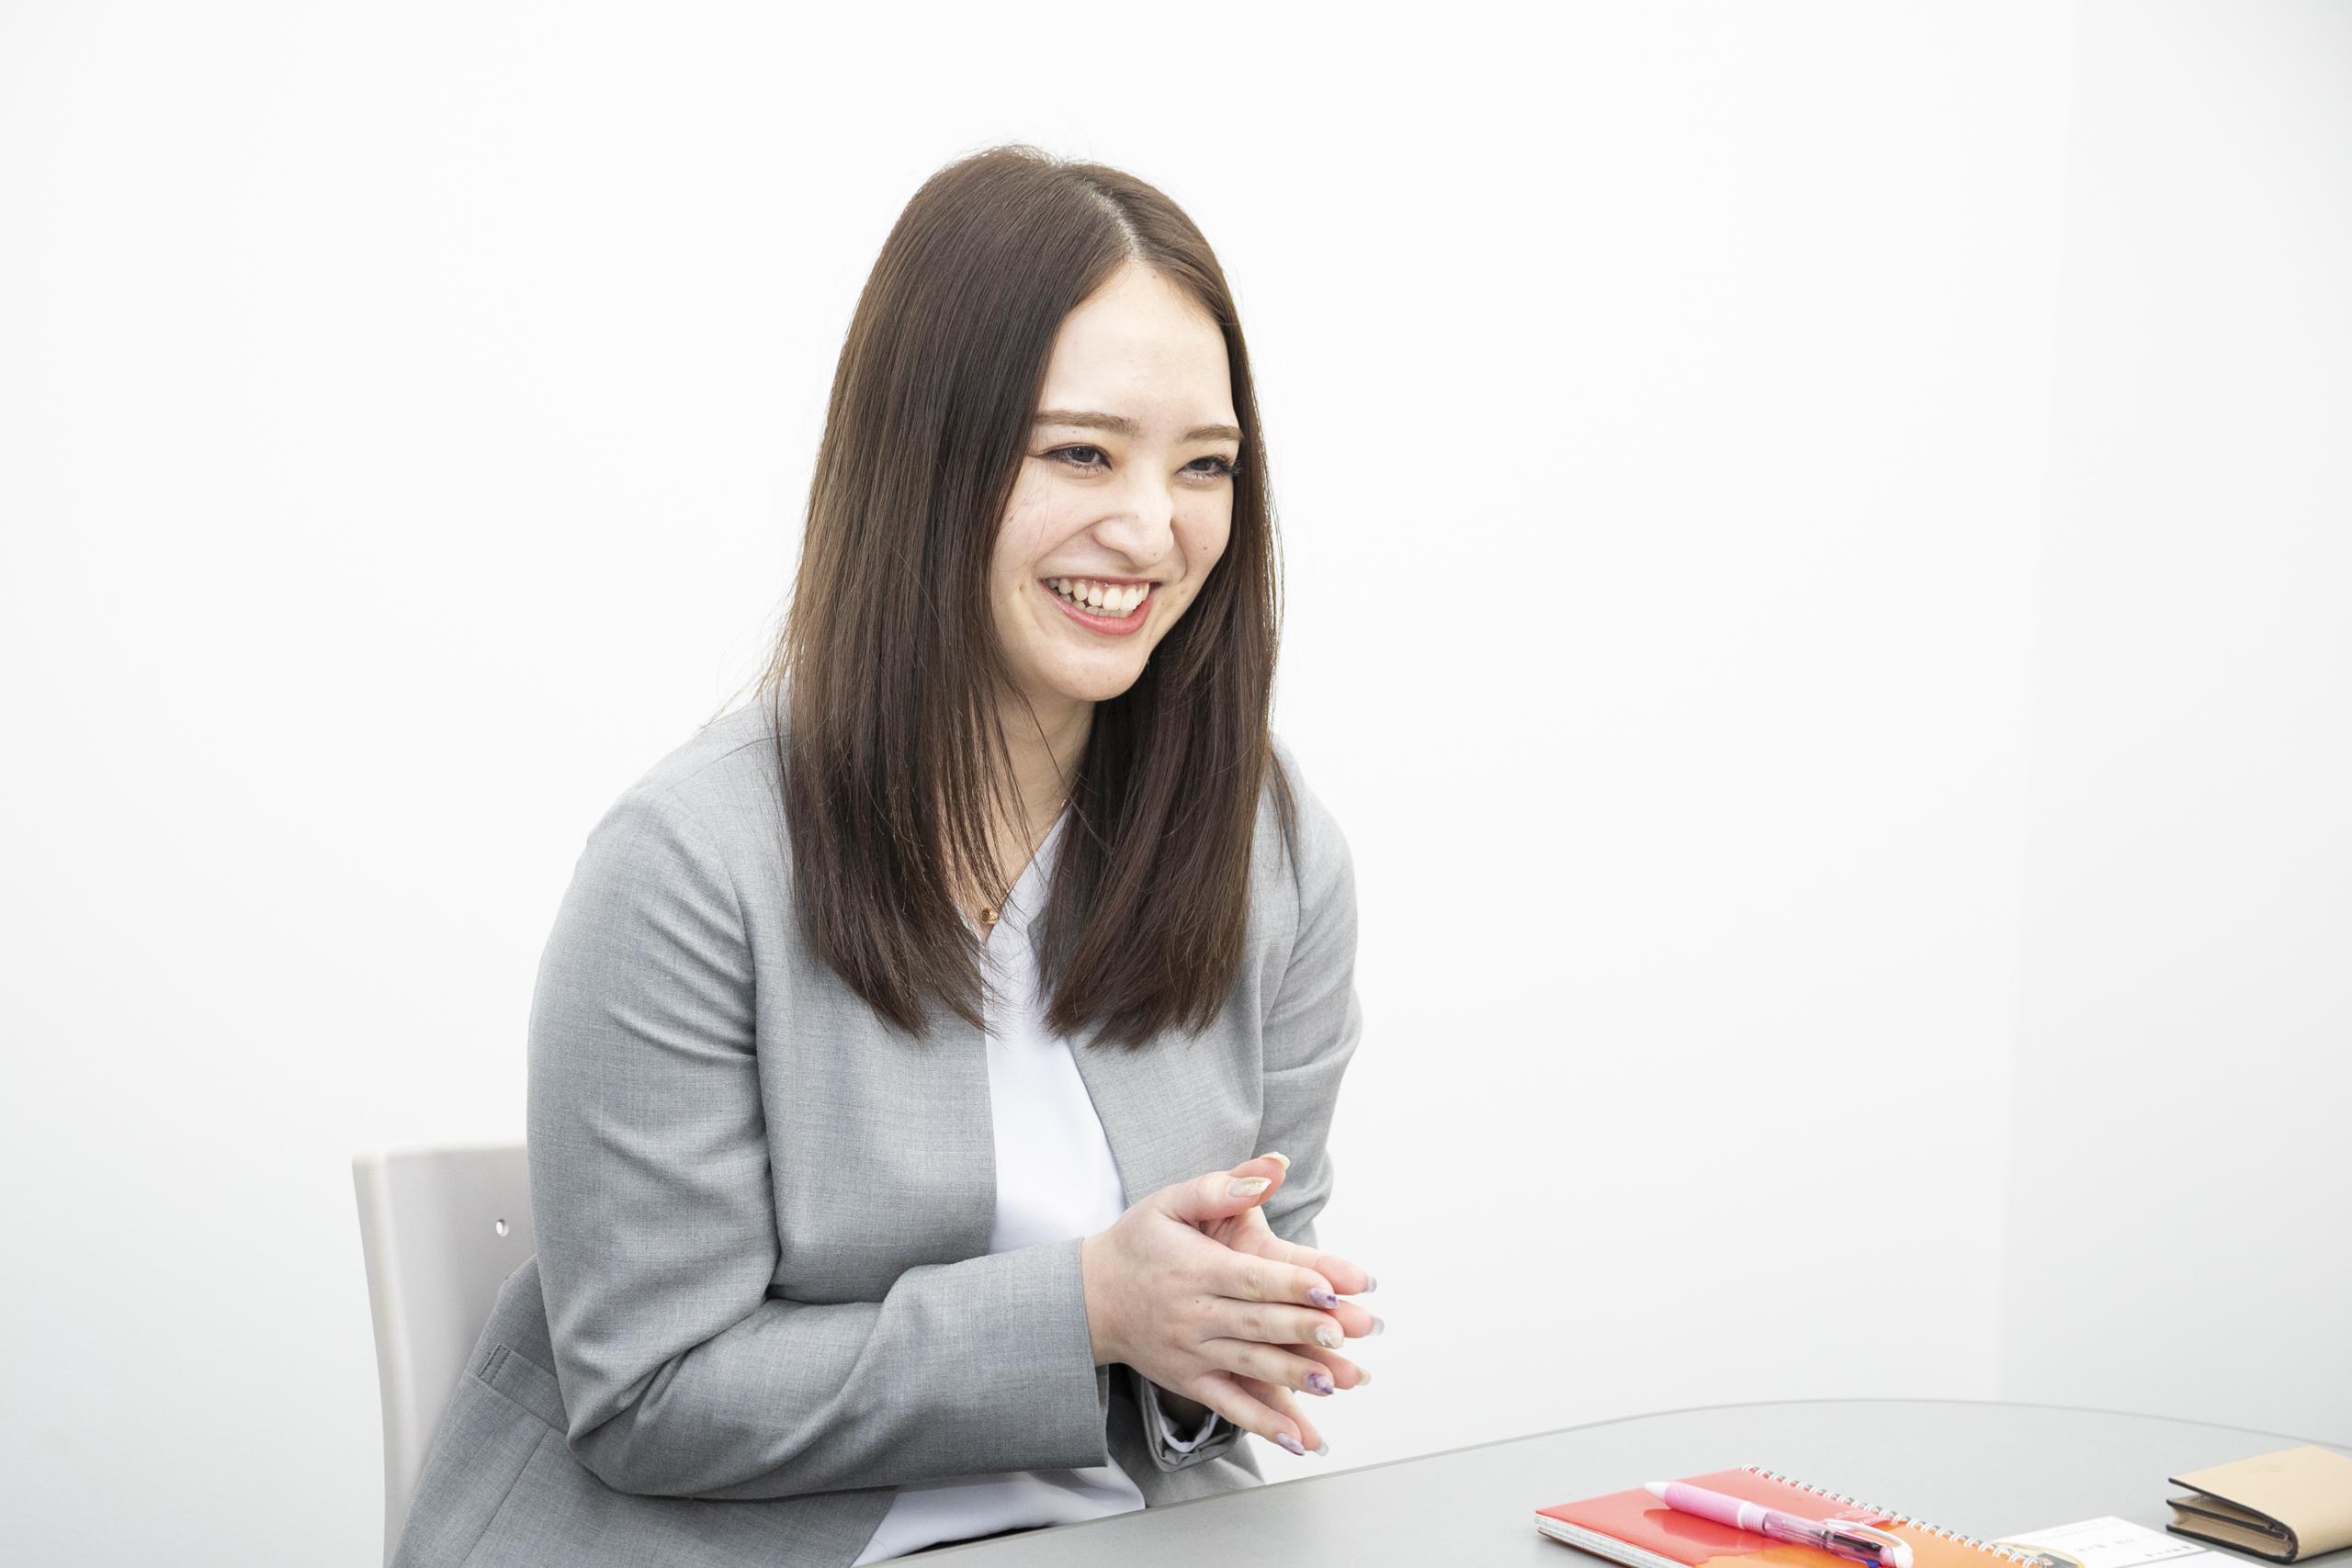 日本電通株式会社人事部江口さん